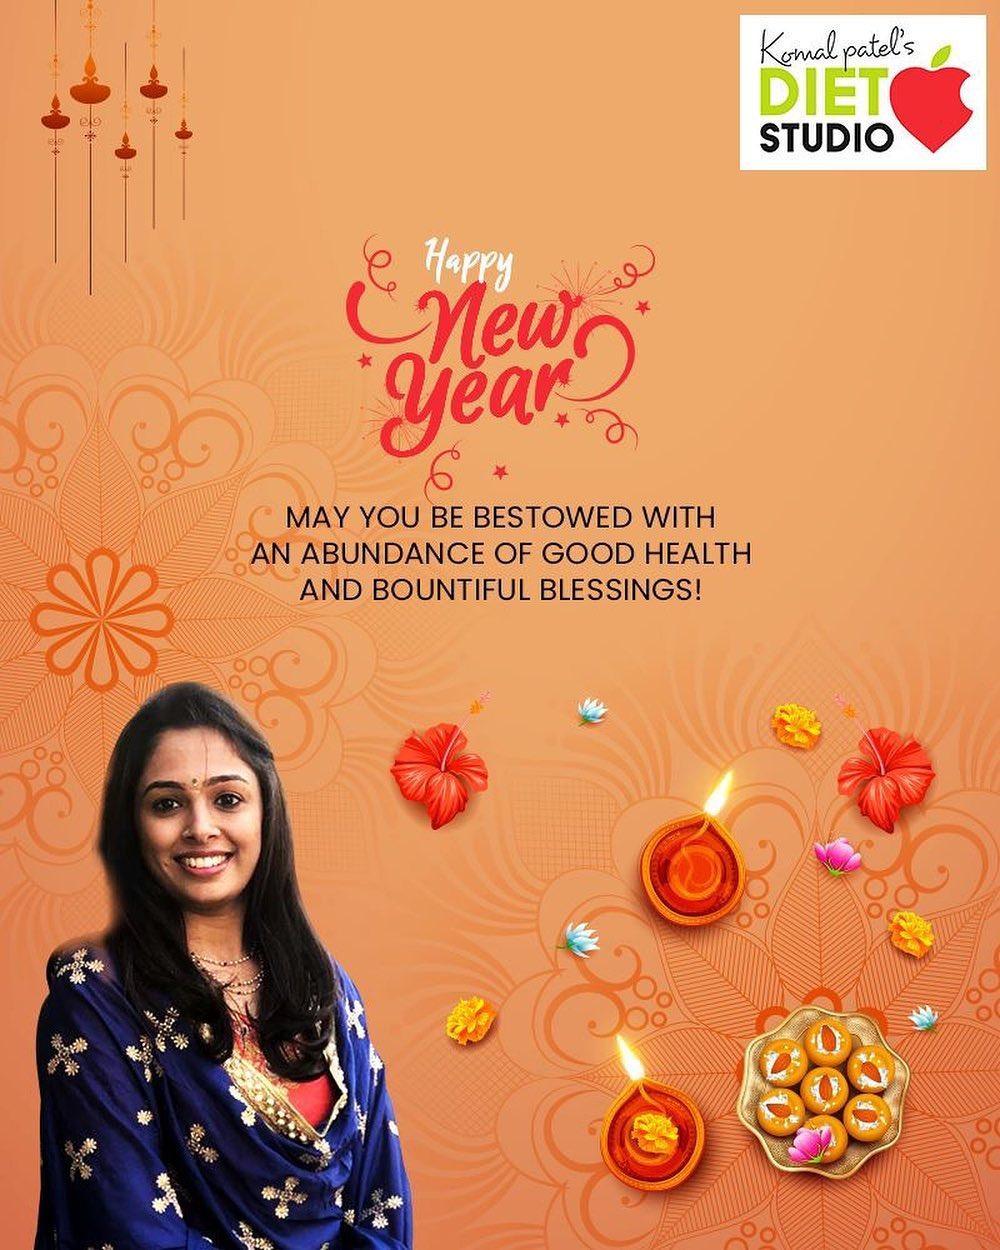 Komal Patel,  NewYear, HappyNewYear, SaalMubarak, IndianFestivals, Celebration, Diwali2019, Diwali, FestivalOfLight, FestivalOfJoy, FestiveSeason, komalpatel, diet, goodfood, eathealthy, goodhealth